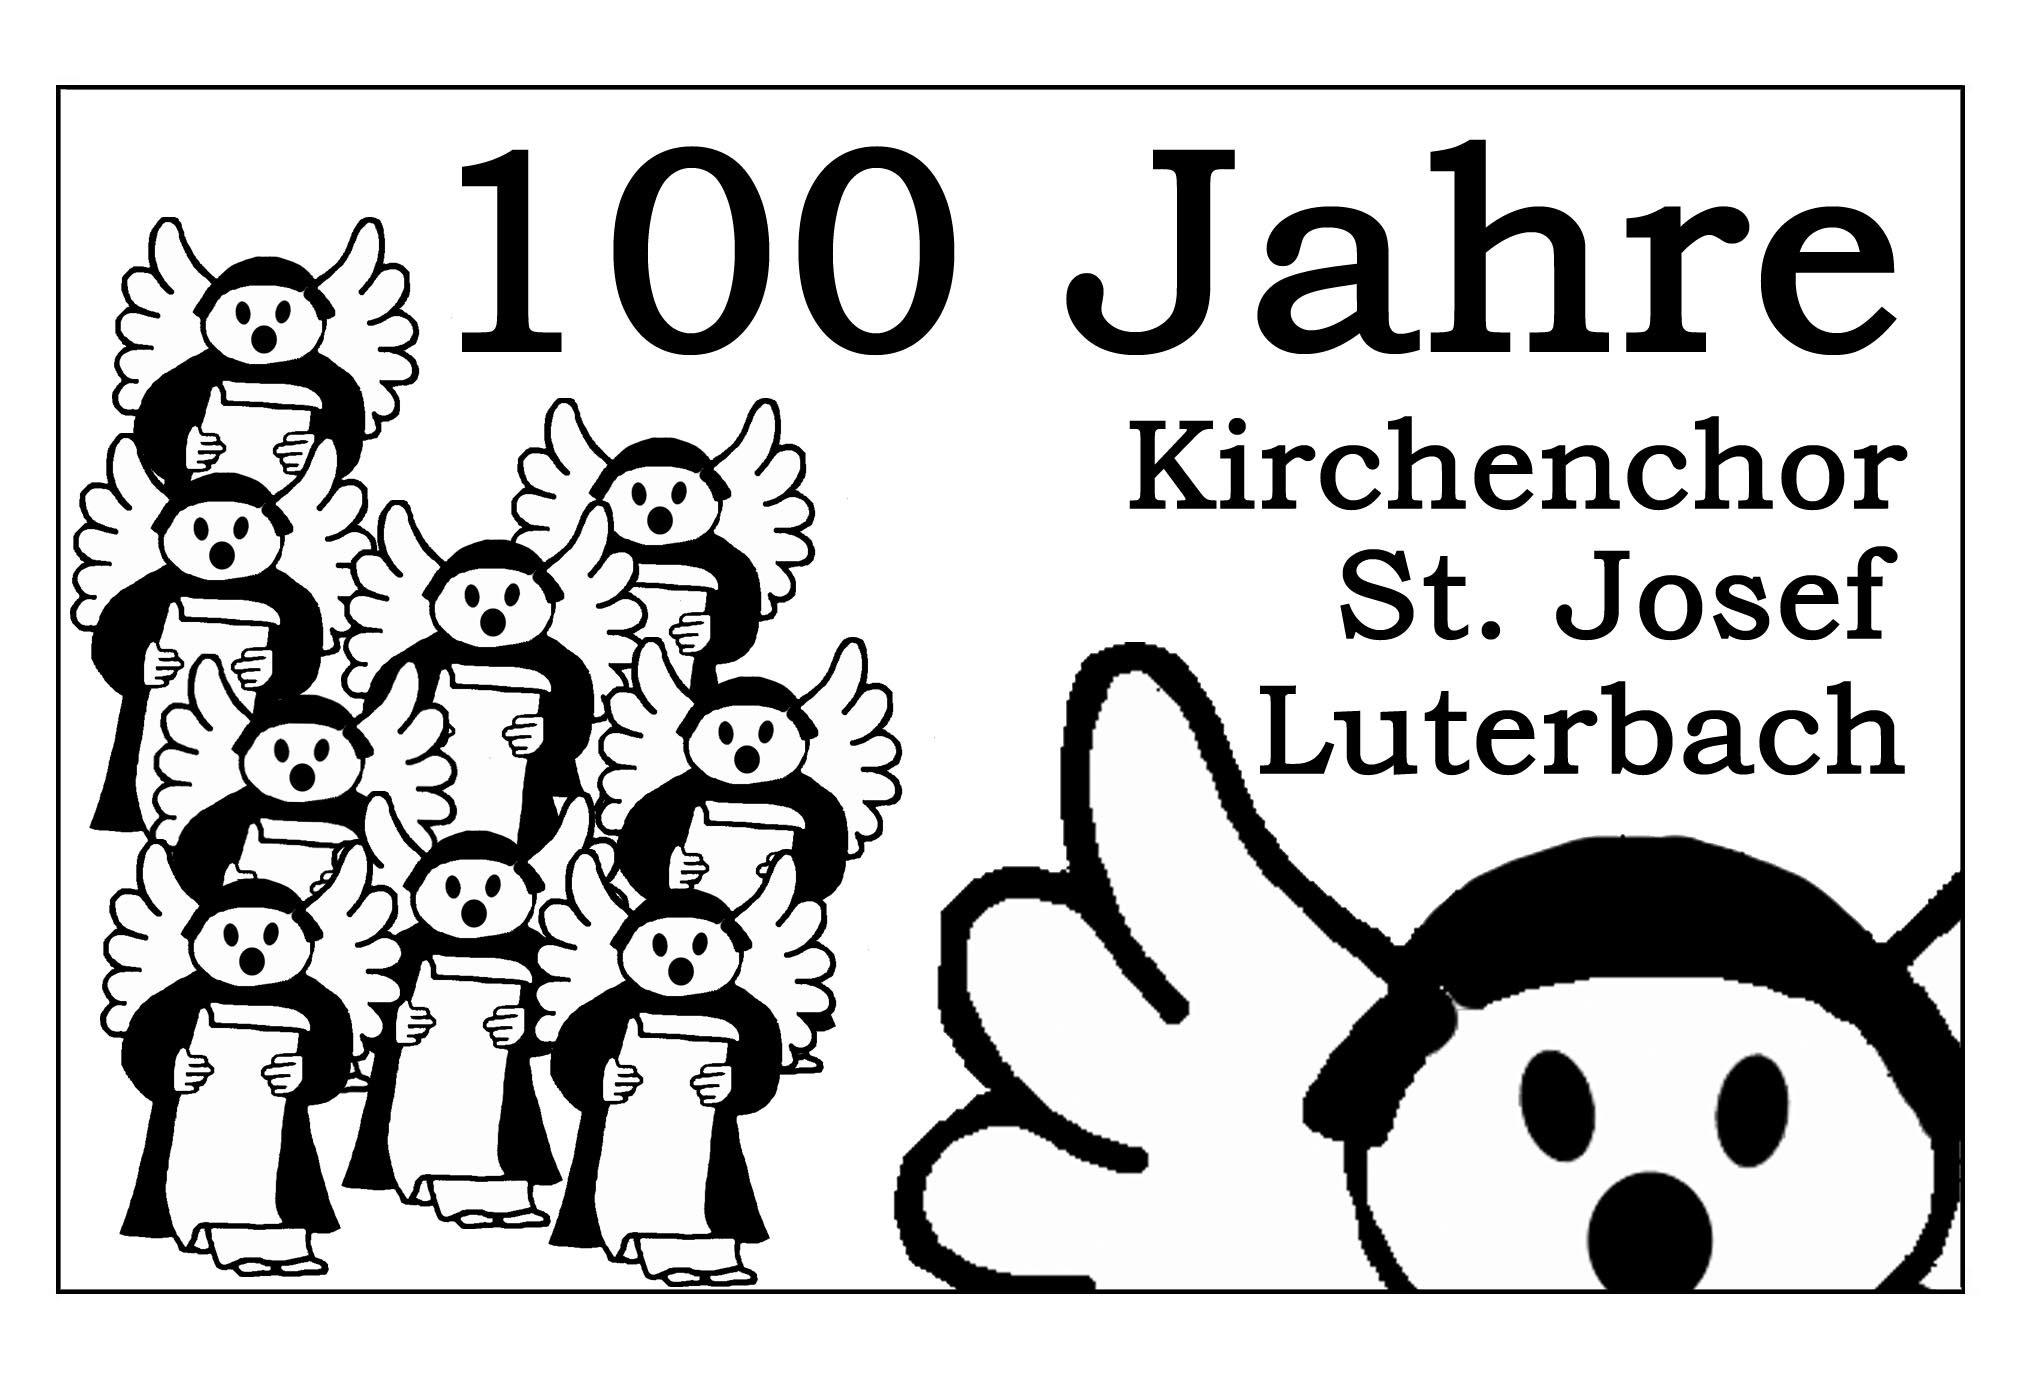 Kirchenchor St. Josef Luterbach